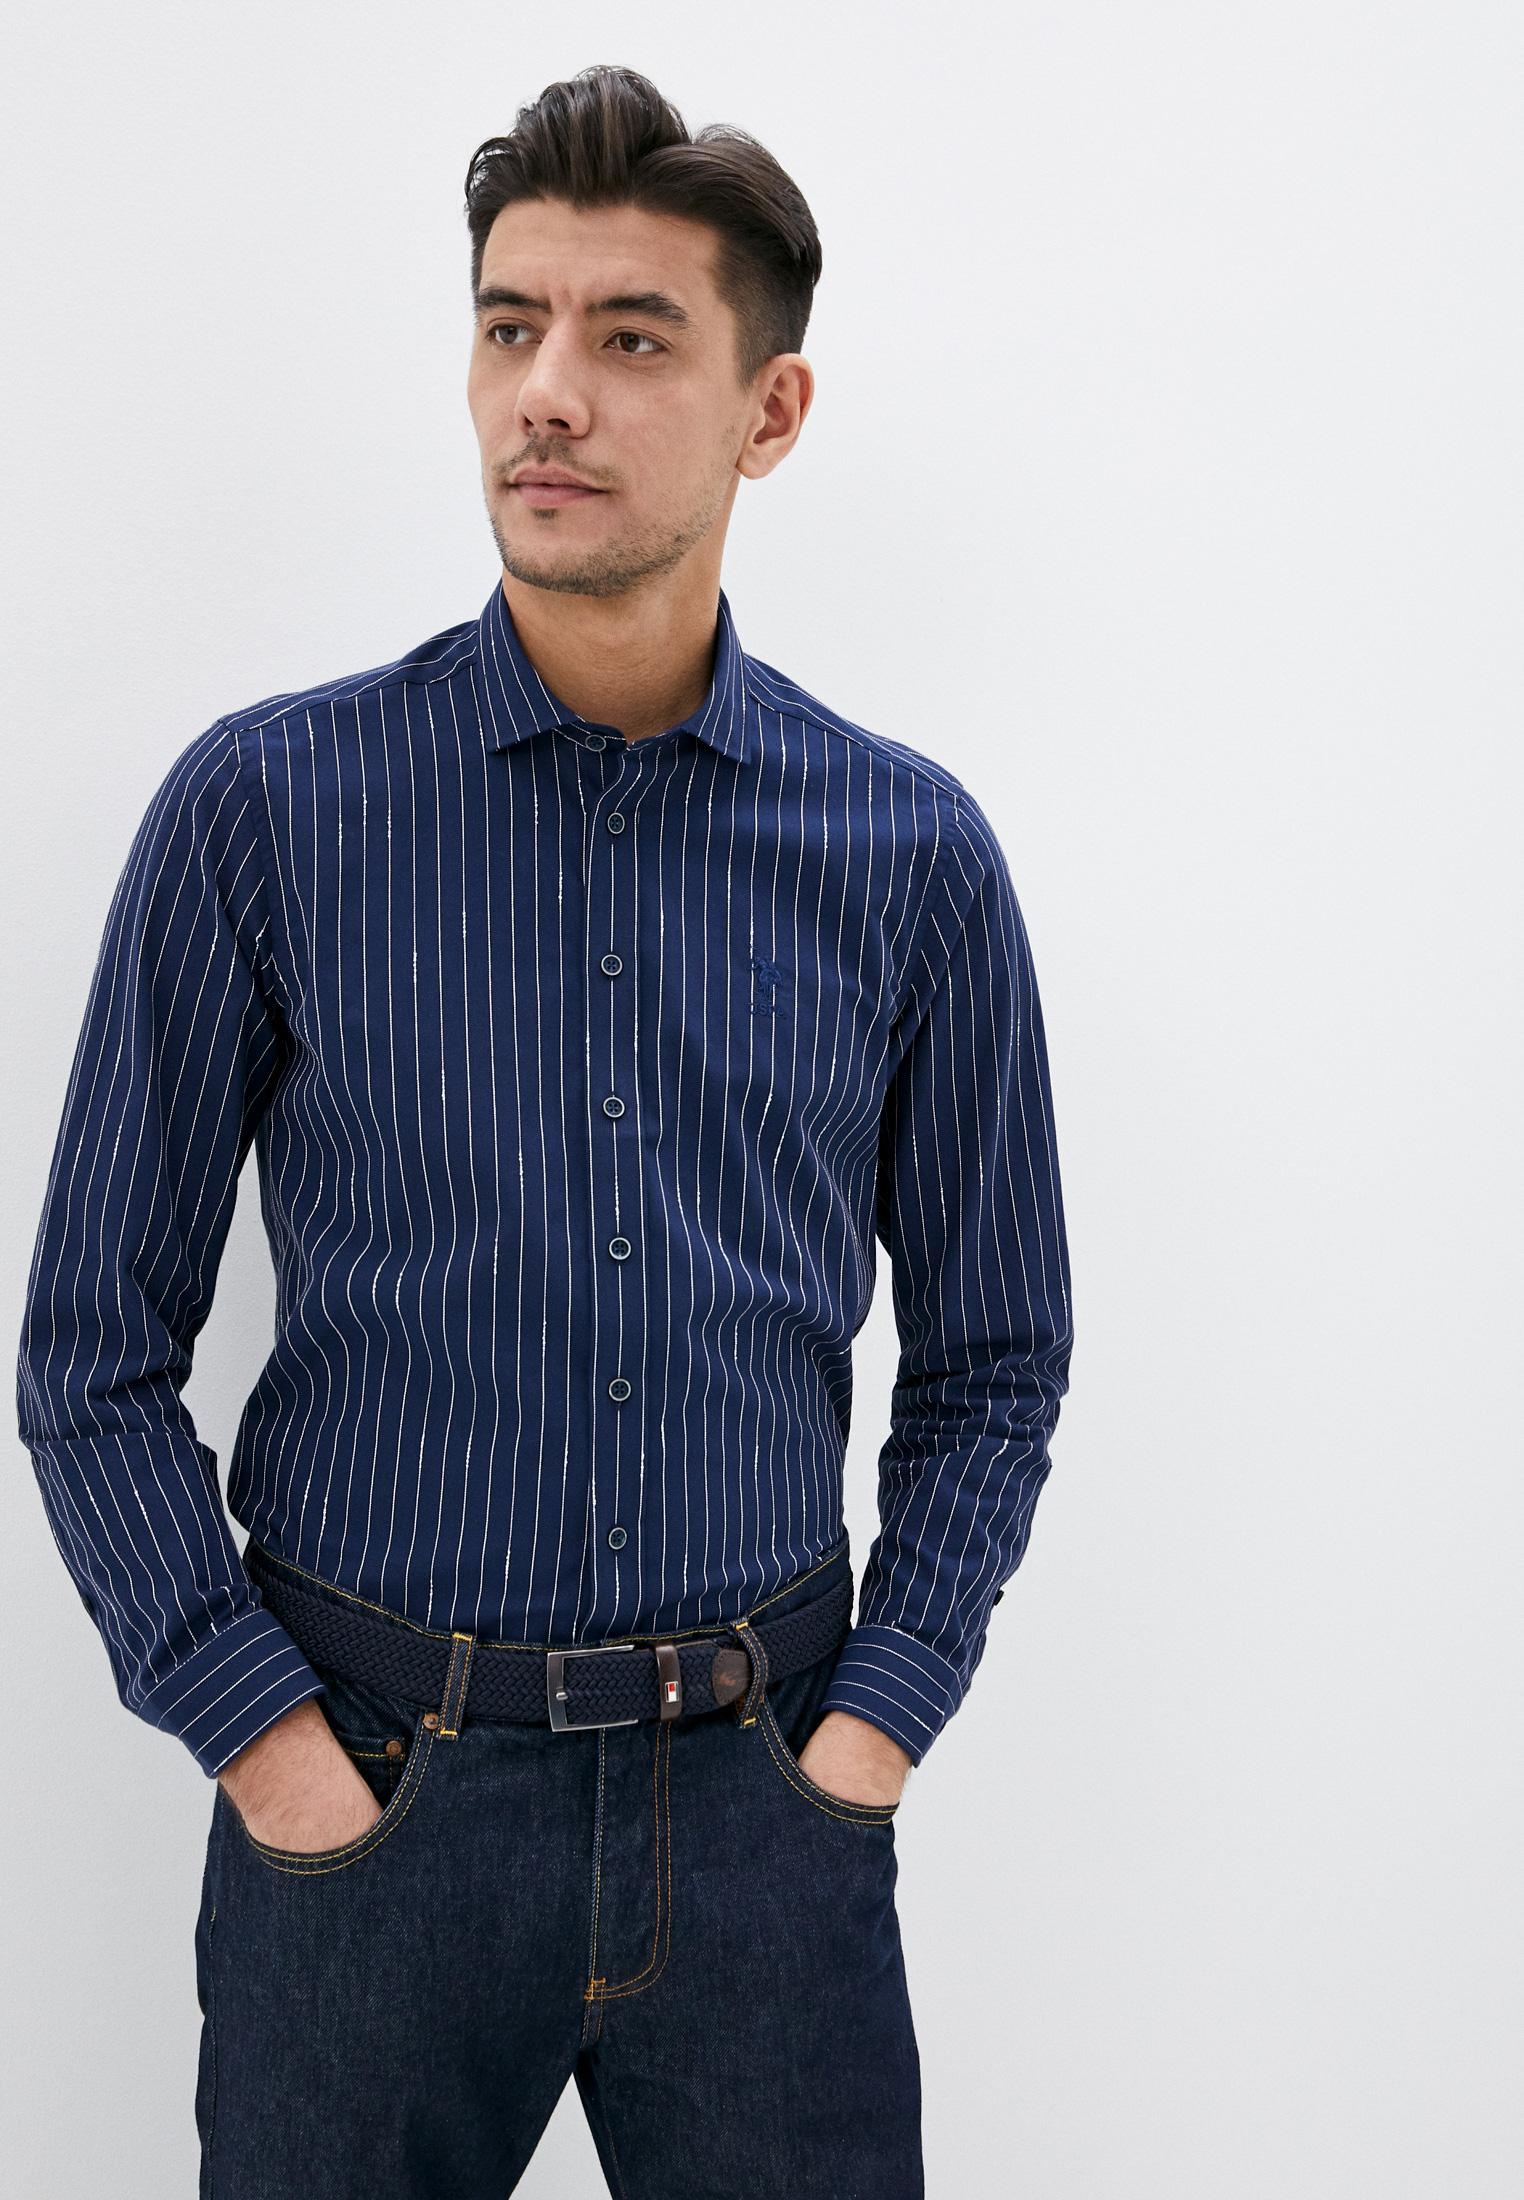 Рубашка U.S. Polo Assn. за 3 899 ₽. в интернет-магазине Lamoda.ru